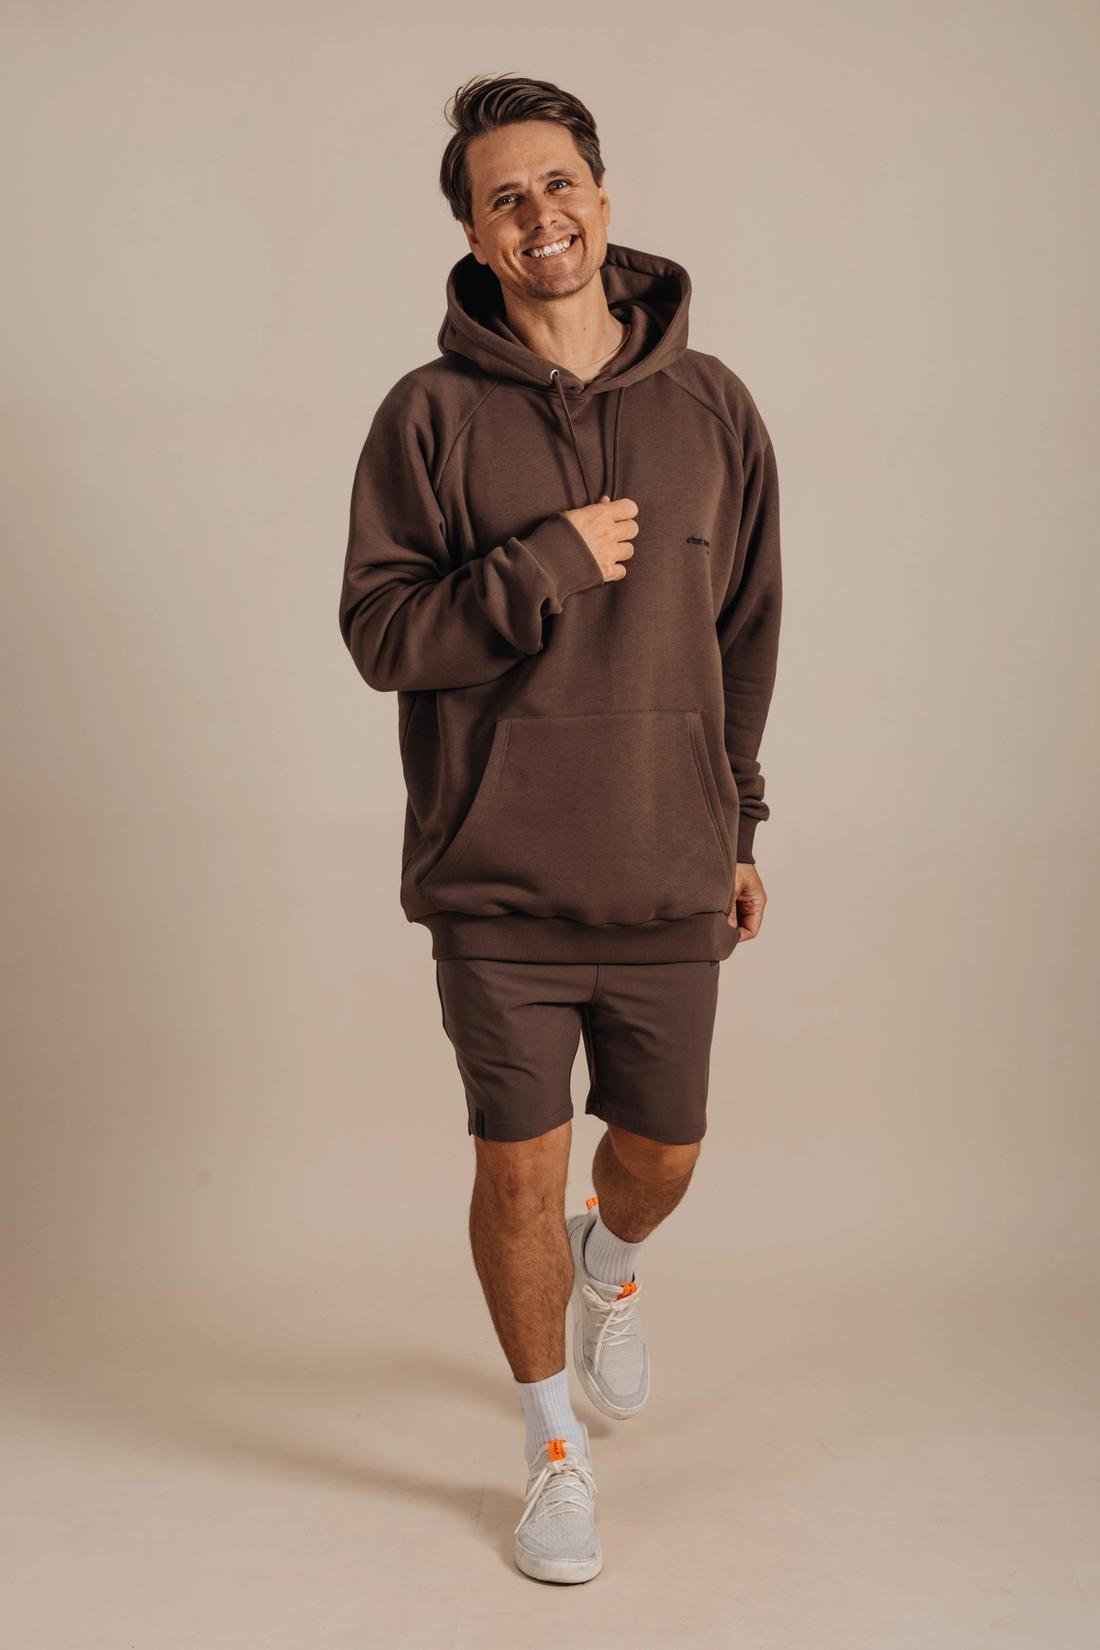 The Proper Shorts